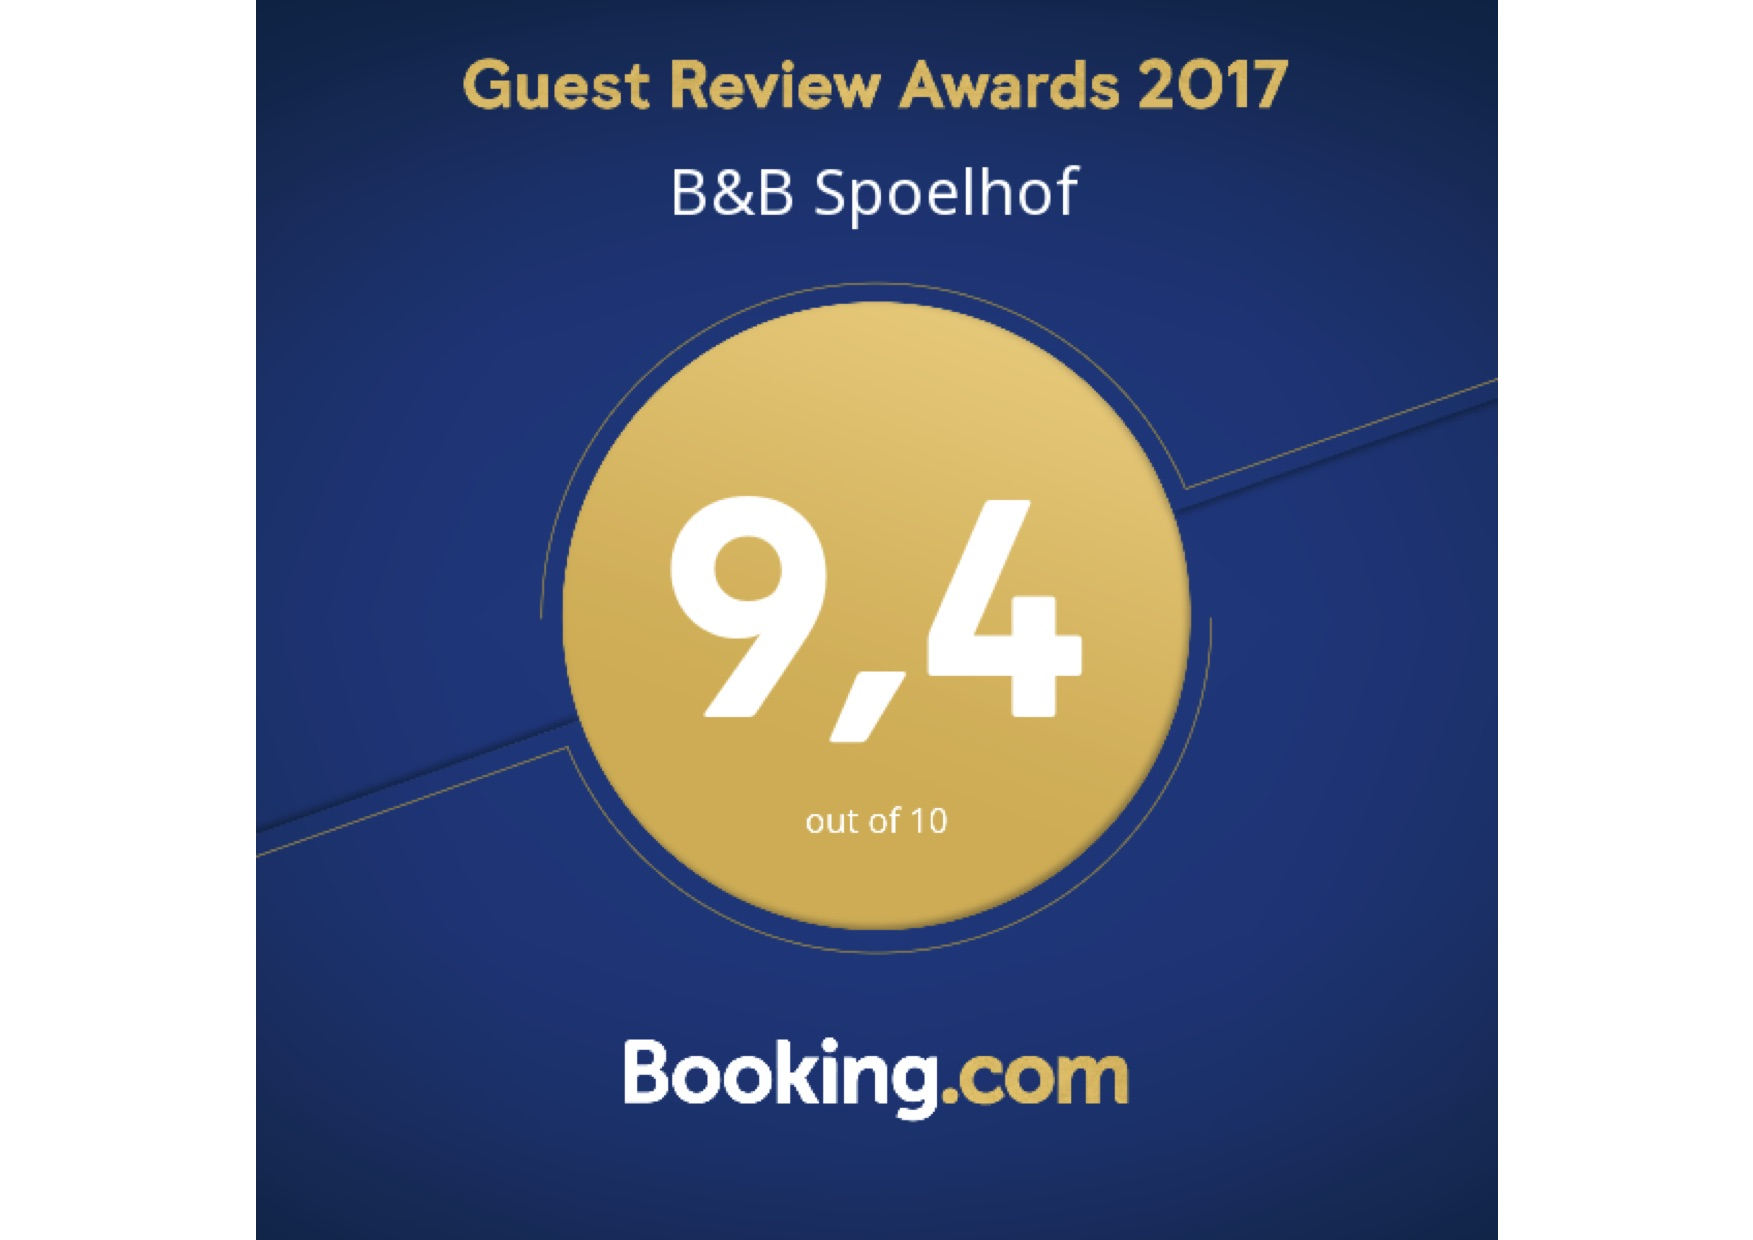 Booking.com Award 2017